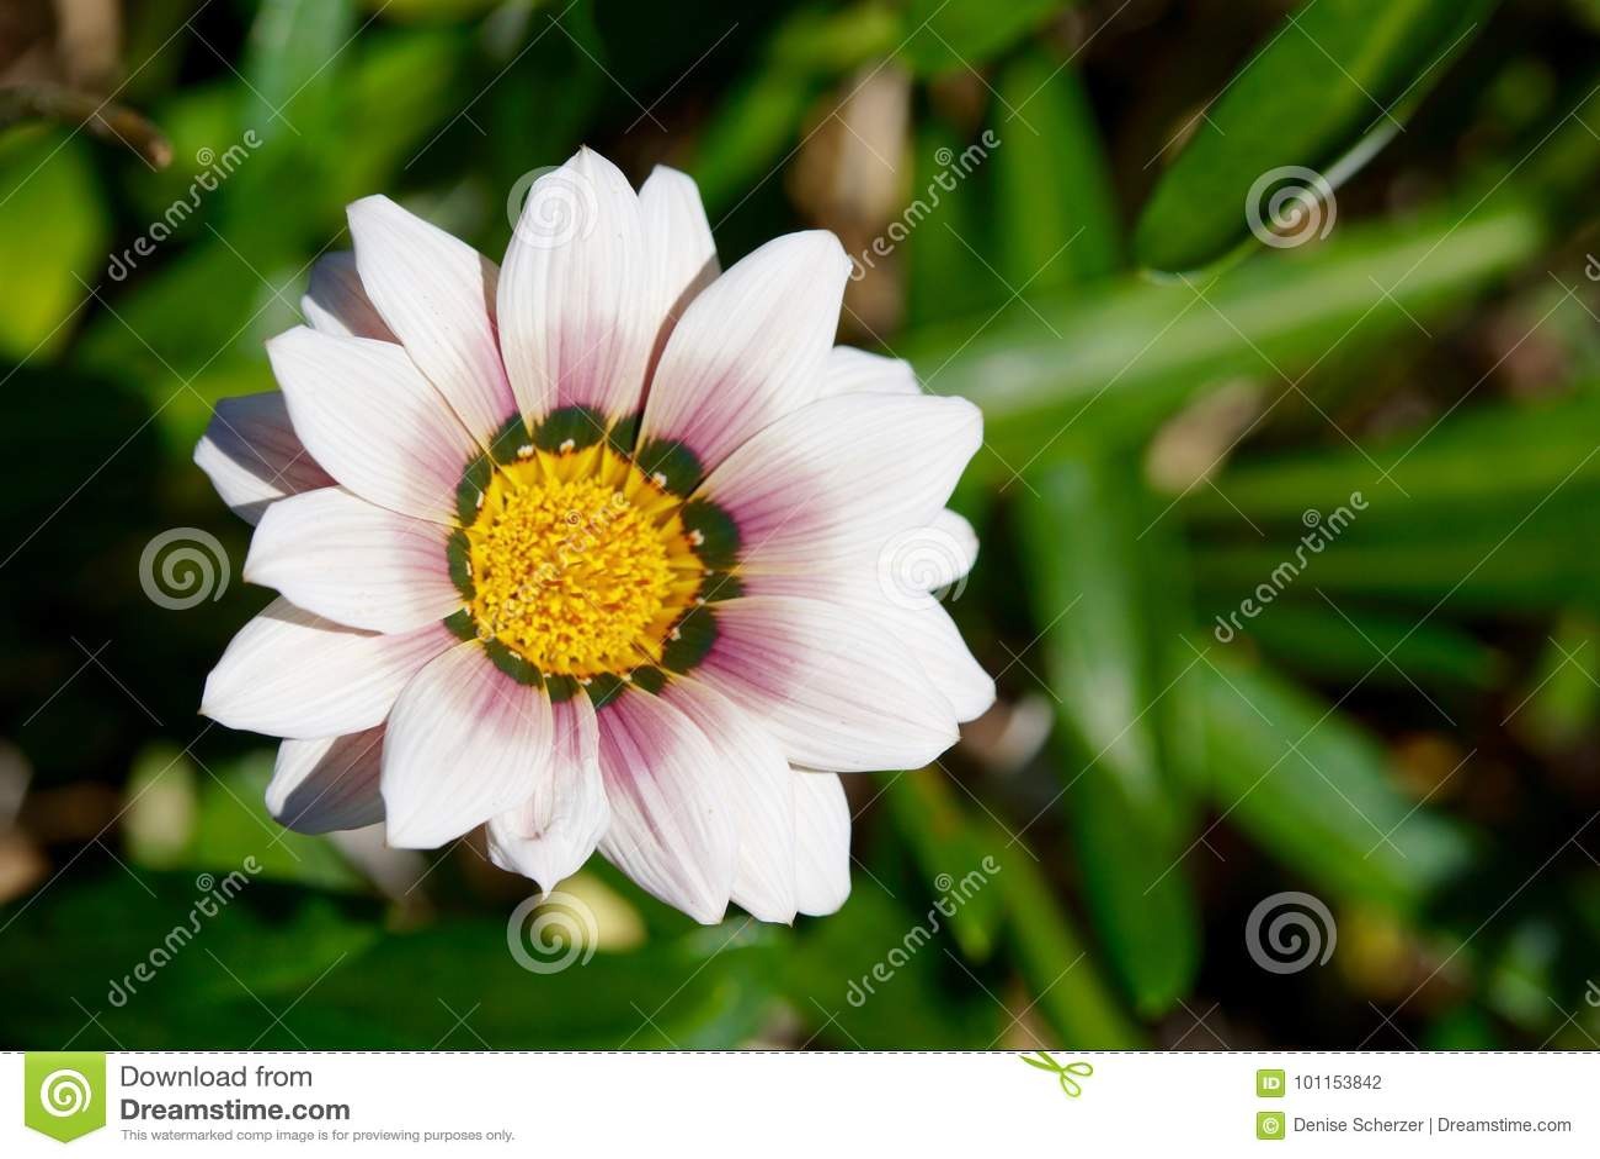 Beautiful white daisy flower closeup stock photo image of flower download beautiful white daisy flower closeup stock photo image of flower pretty 101153842 mightylinksfo